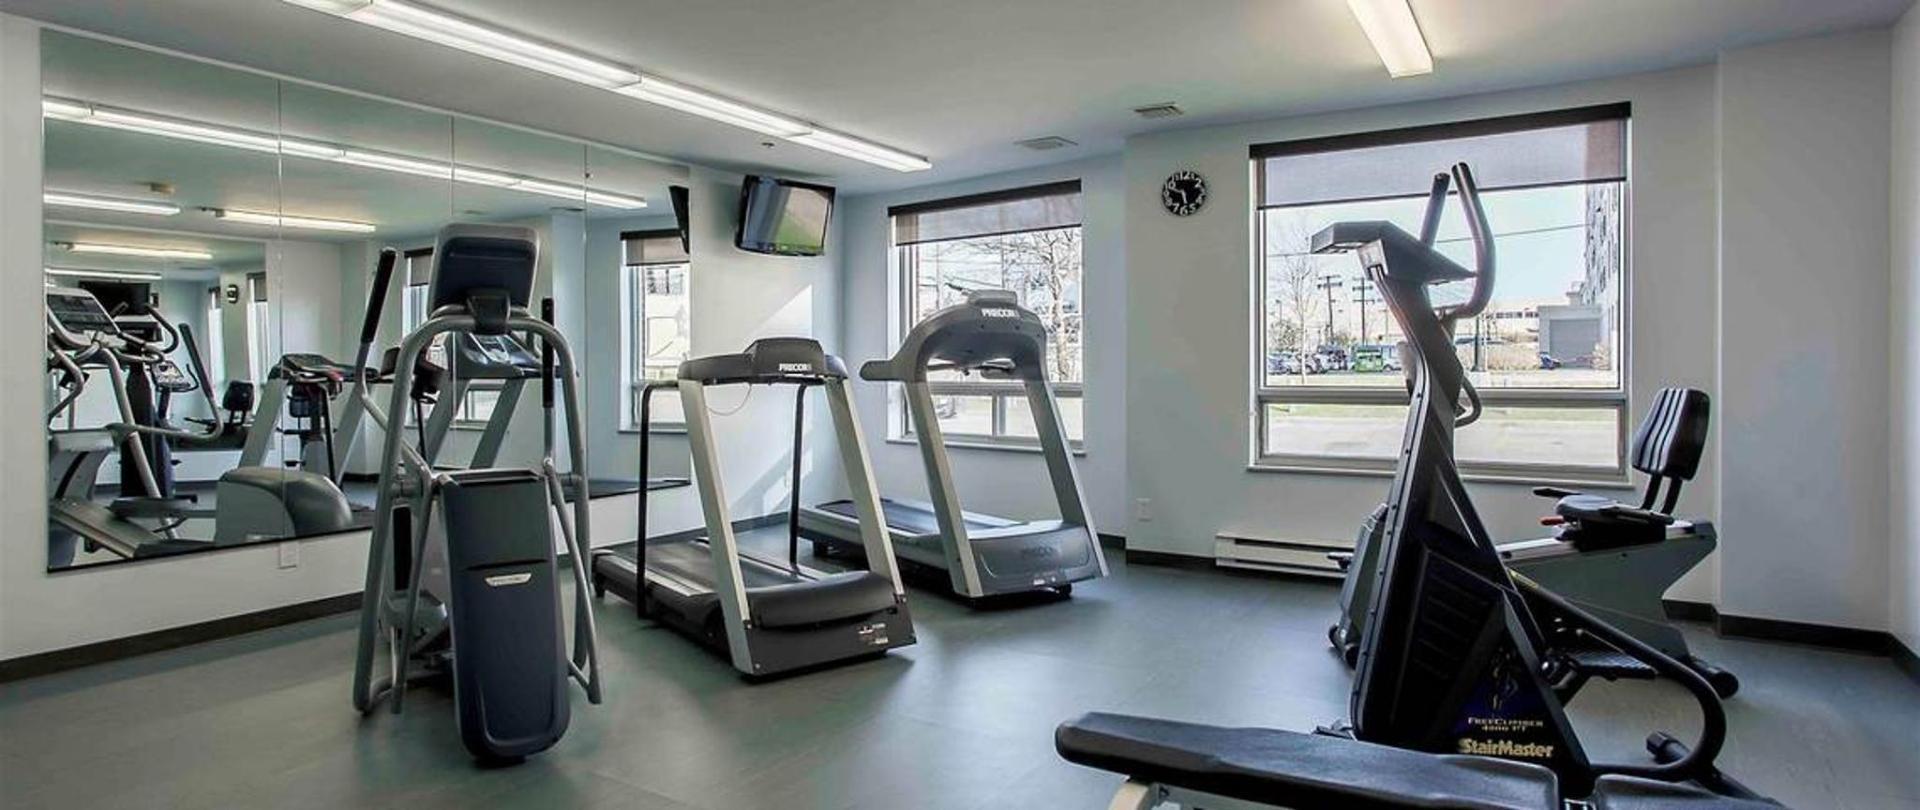 fitness-1-4.jpg.1140x481_default.jpg